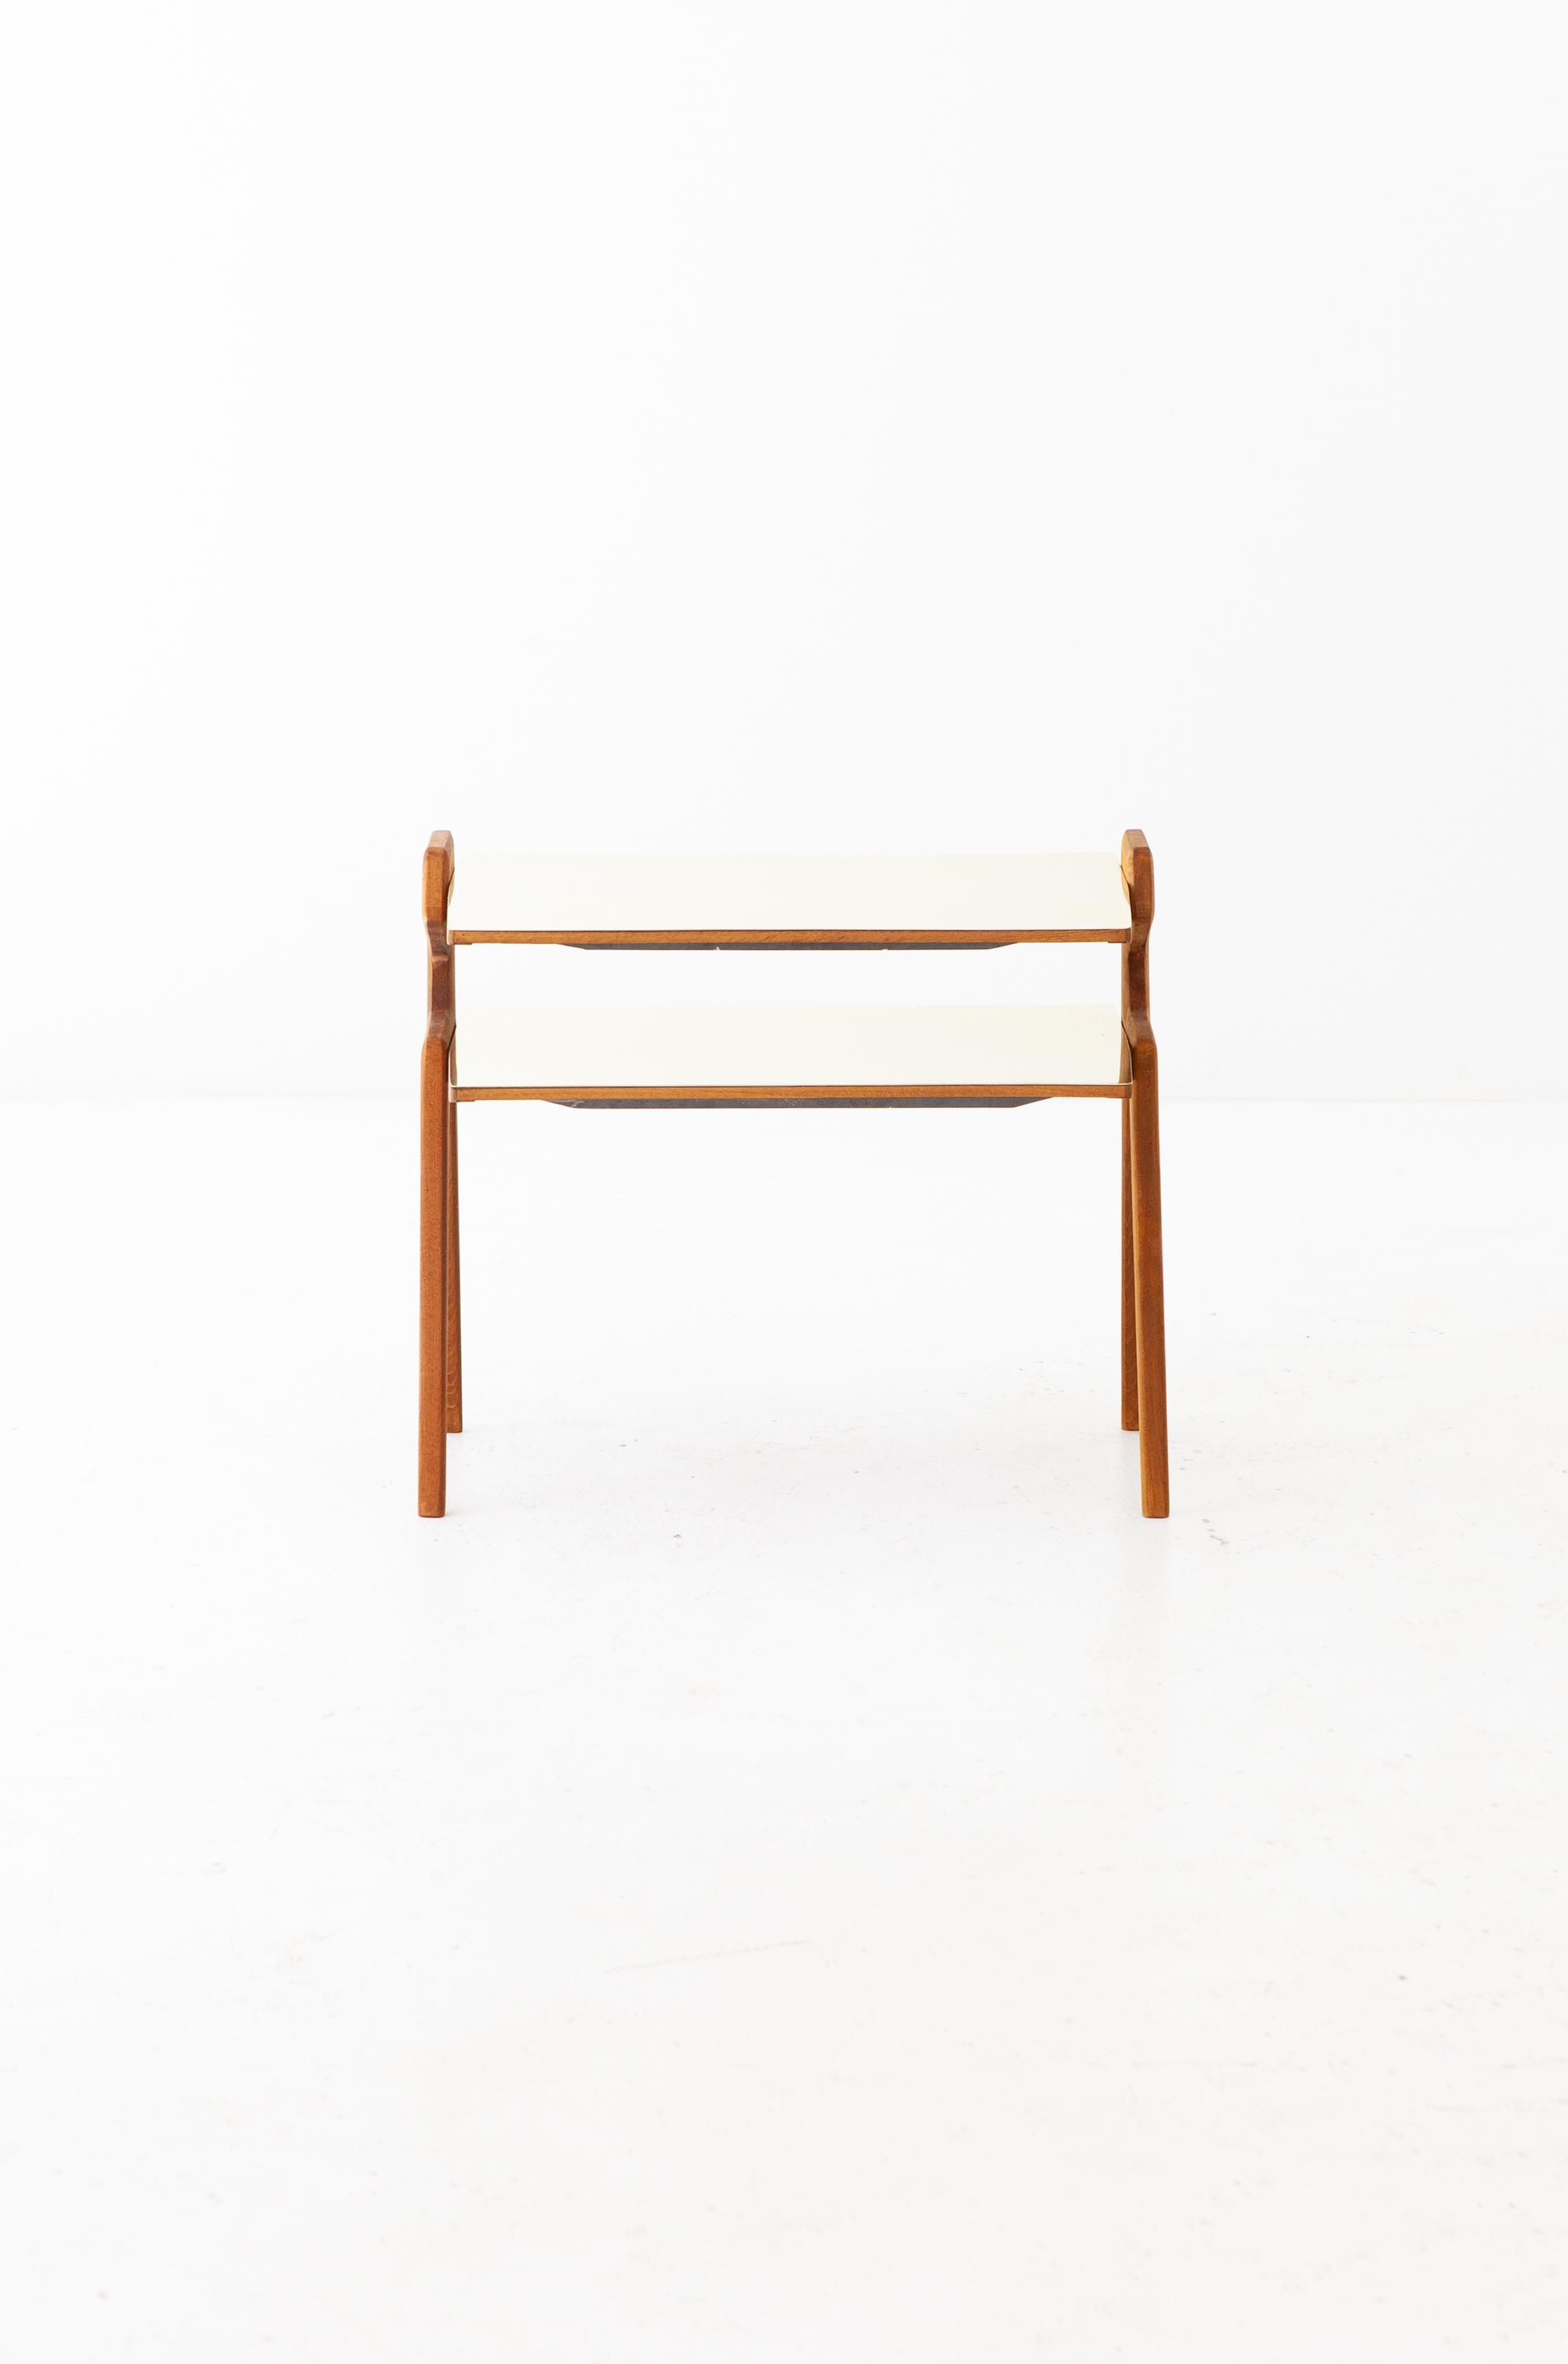 1950s-italian-brass-light-wood-two-levels-side-table-5-t81